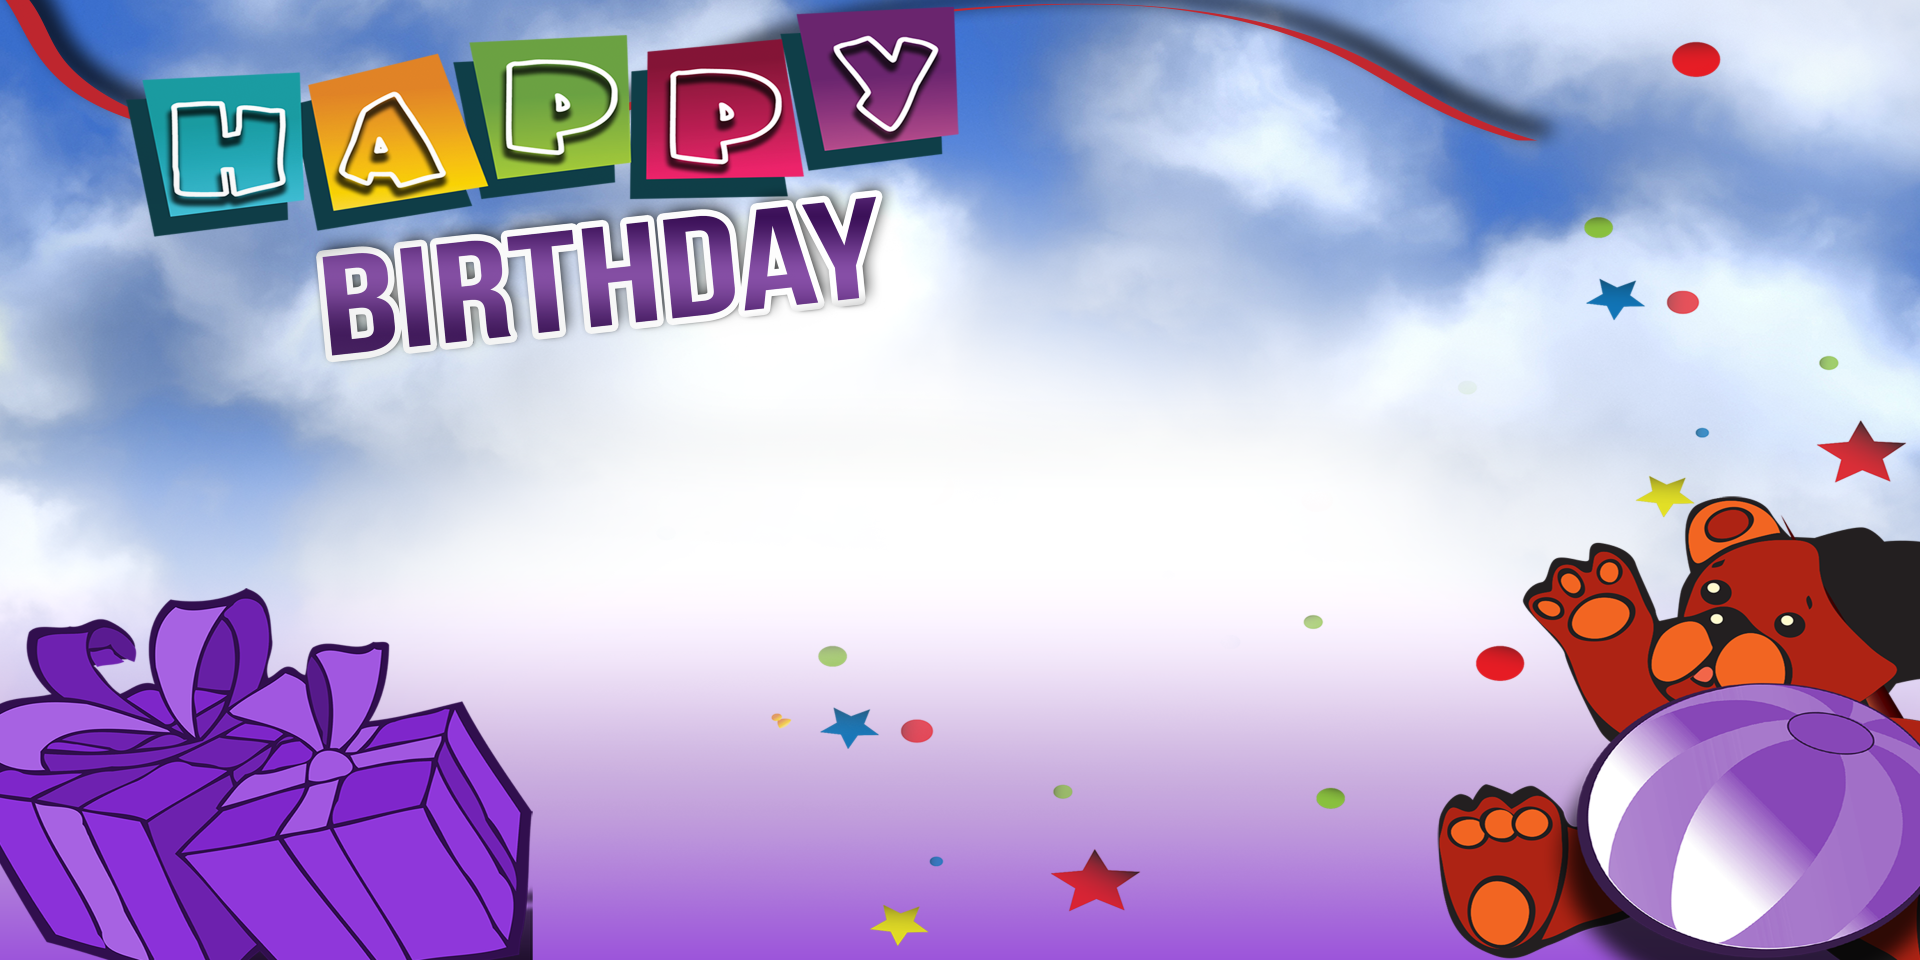 Favorite Happy Birthday Banner - Purple Bear - Vinyl Banners | Gatorprints HN59